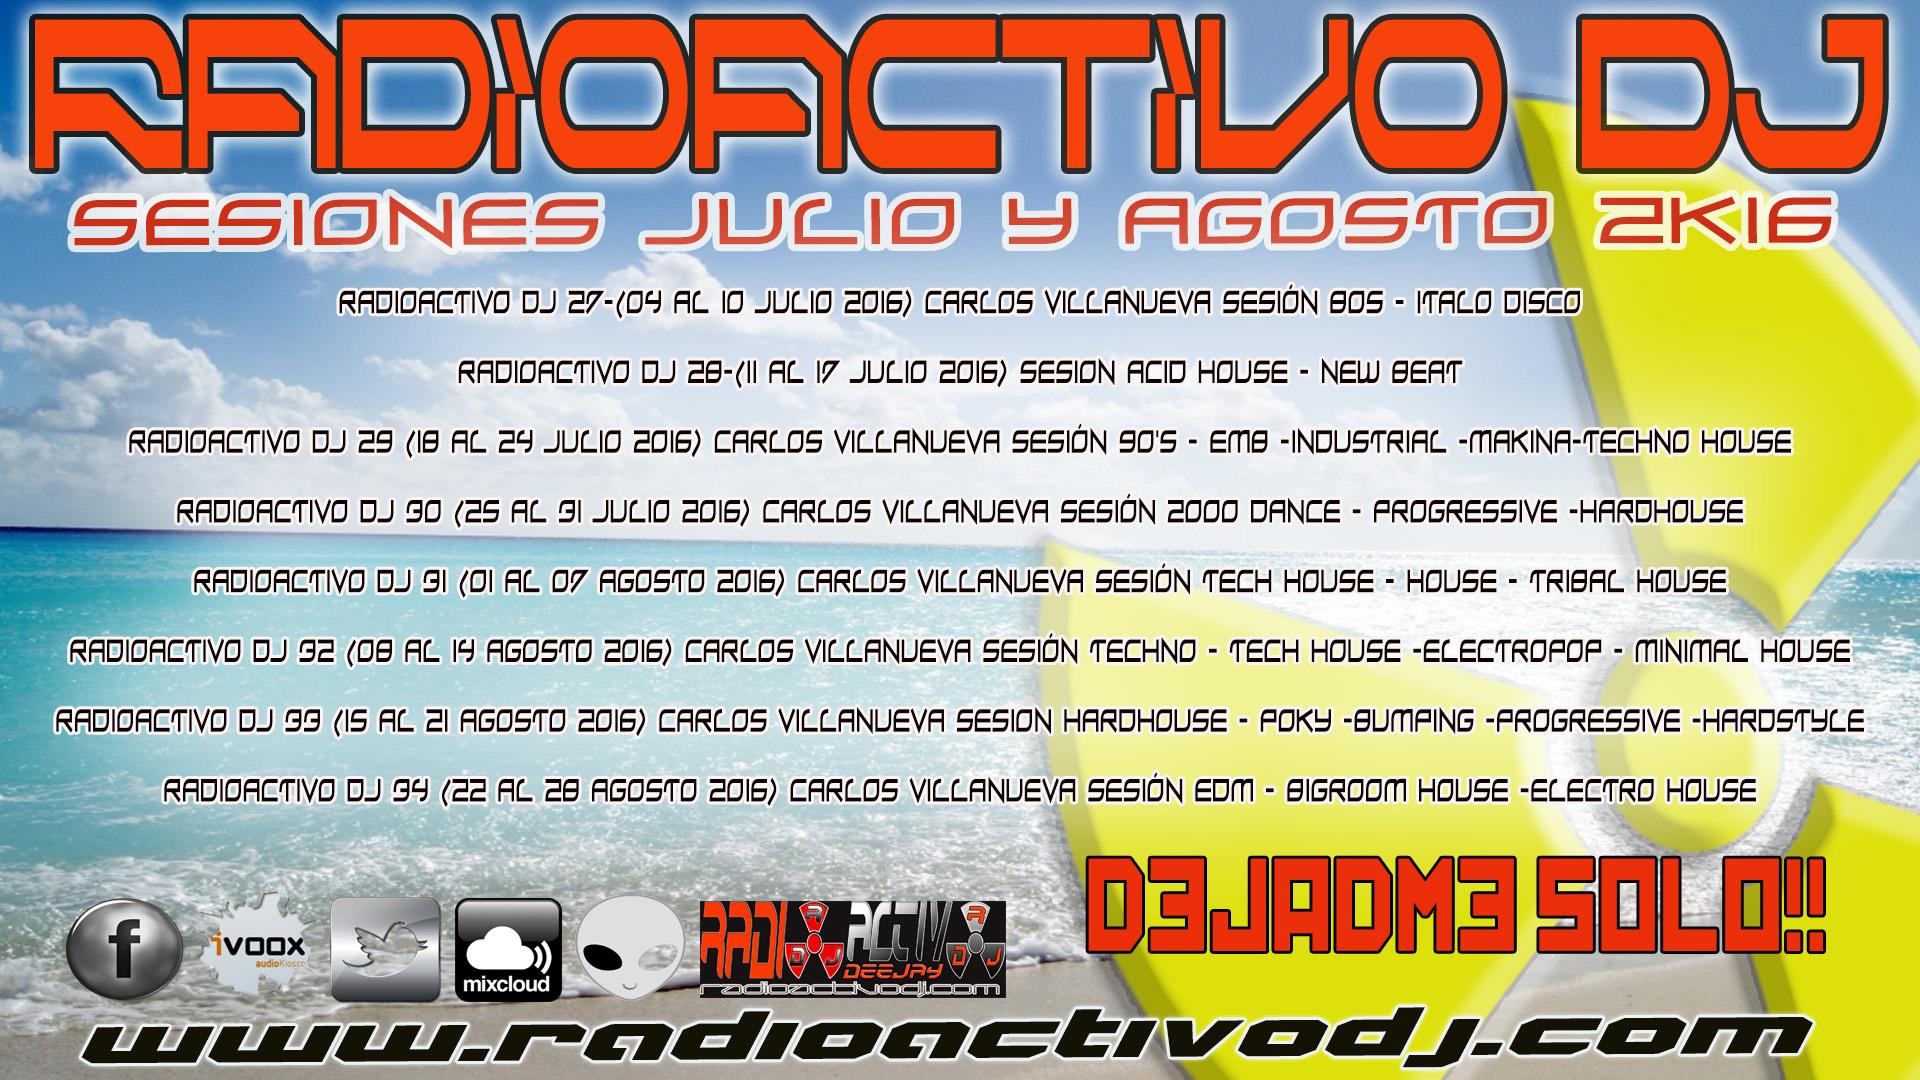 RADIOACTIVO-DJ-SESSIONS-2016-SUMMER-2016-2